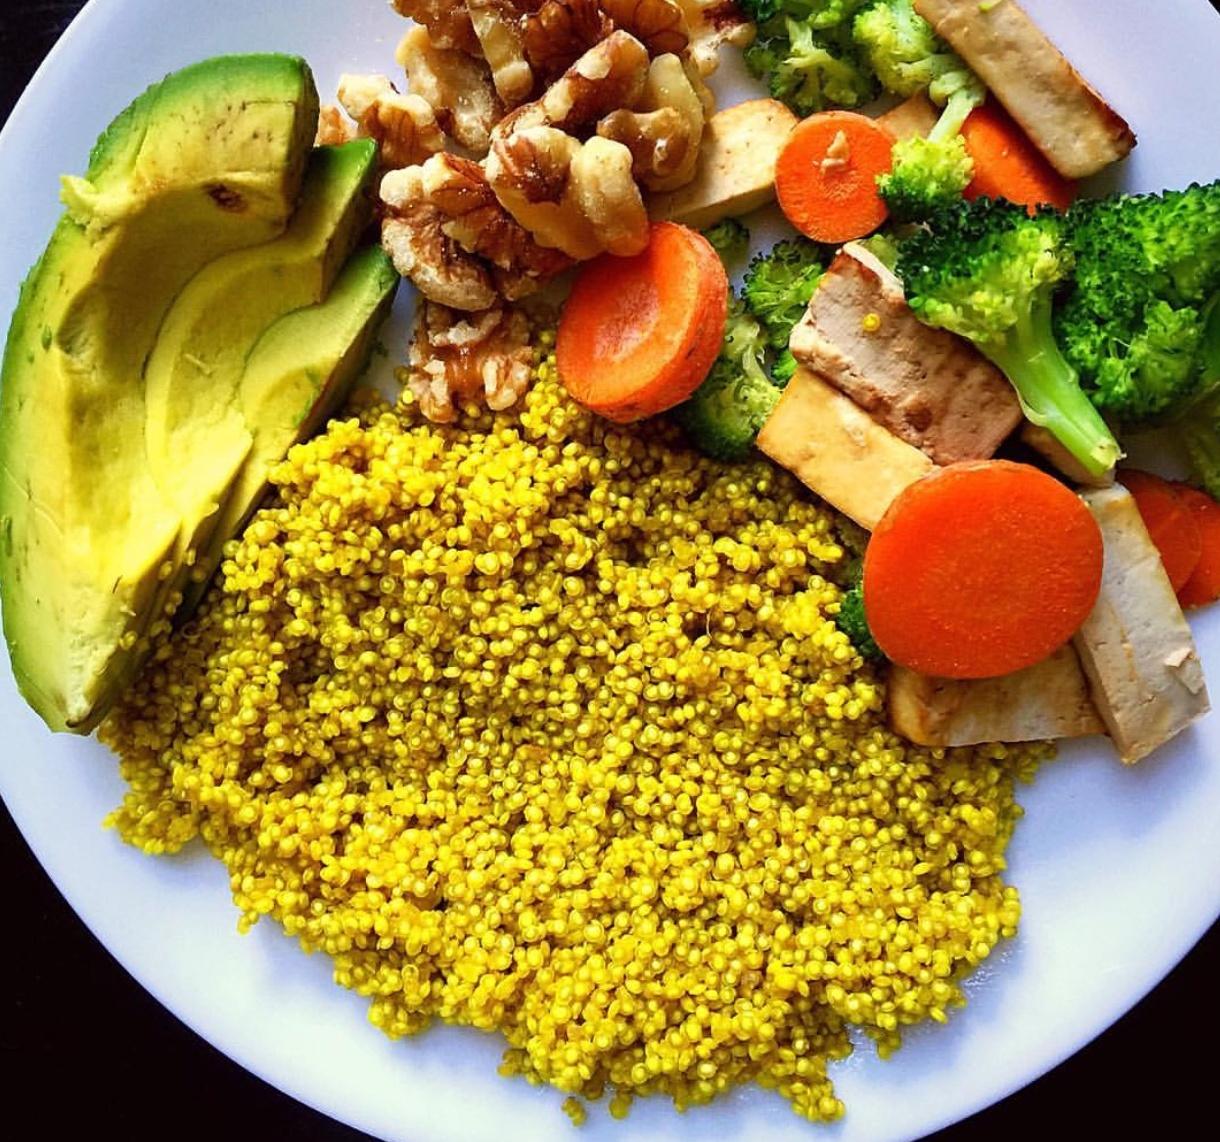 Vegan Turmeric Quinoa and Roasted Vegetables